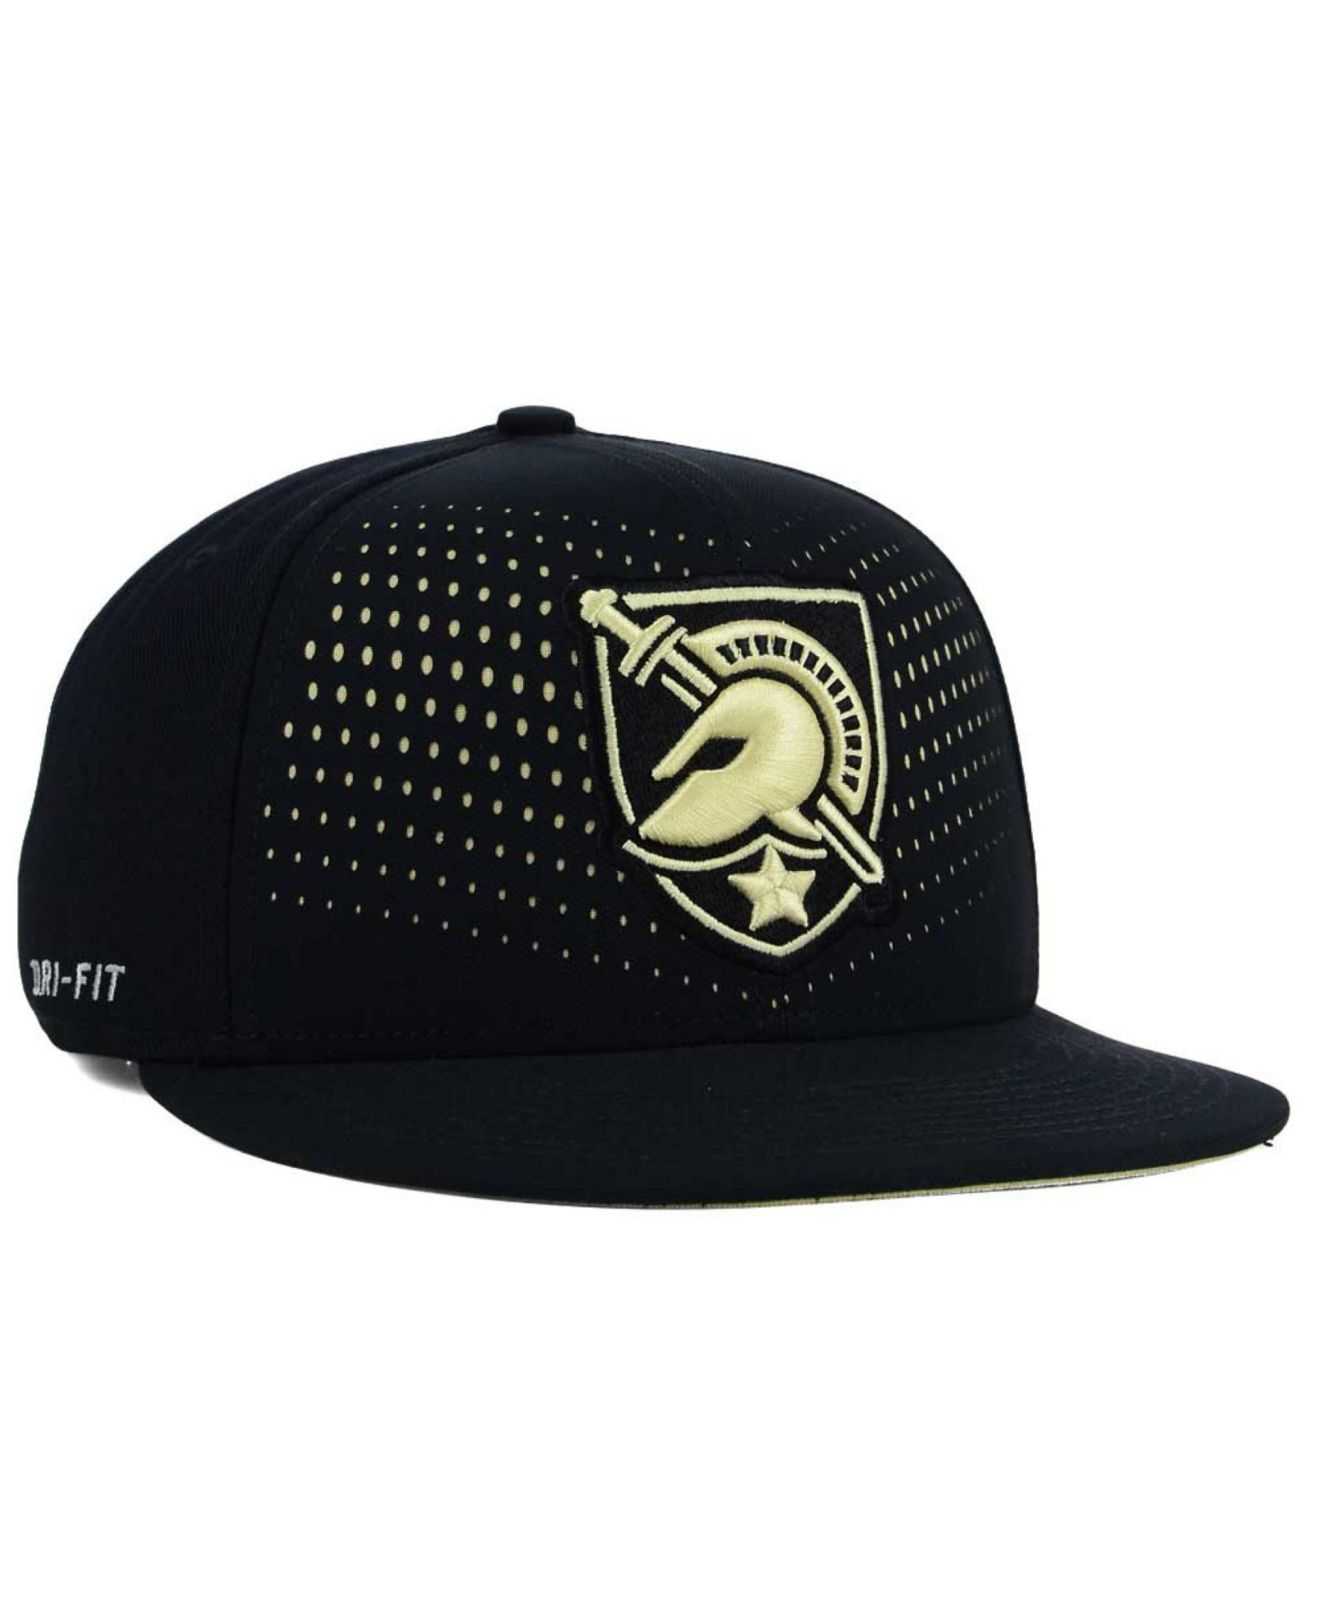 bf326285d51 promo code for lyst nike army black knights true seasonal snapback cap in  black 88314 d51f1